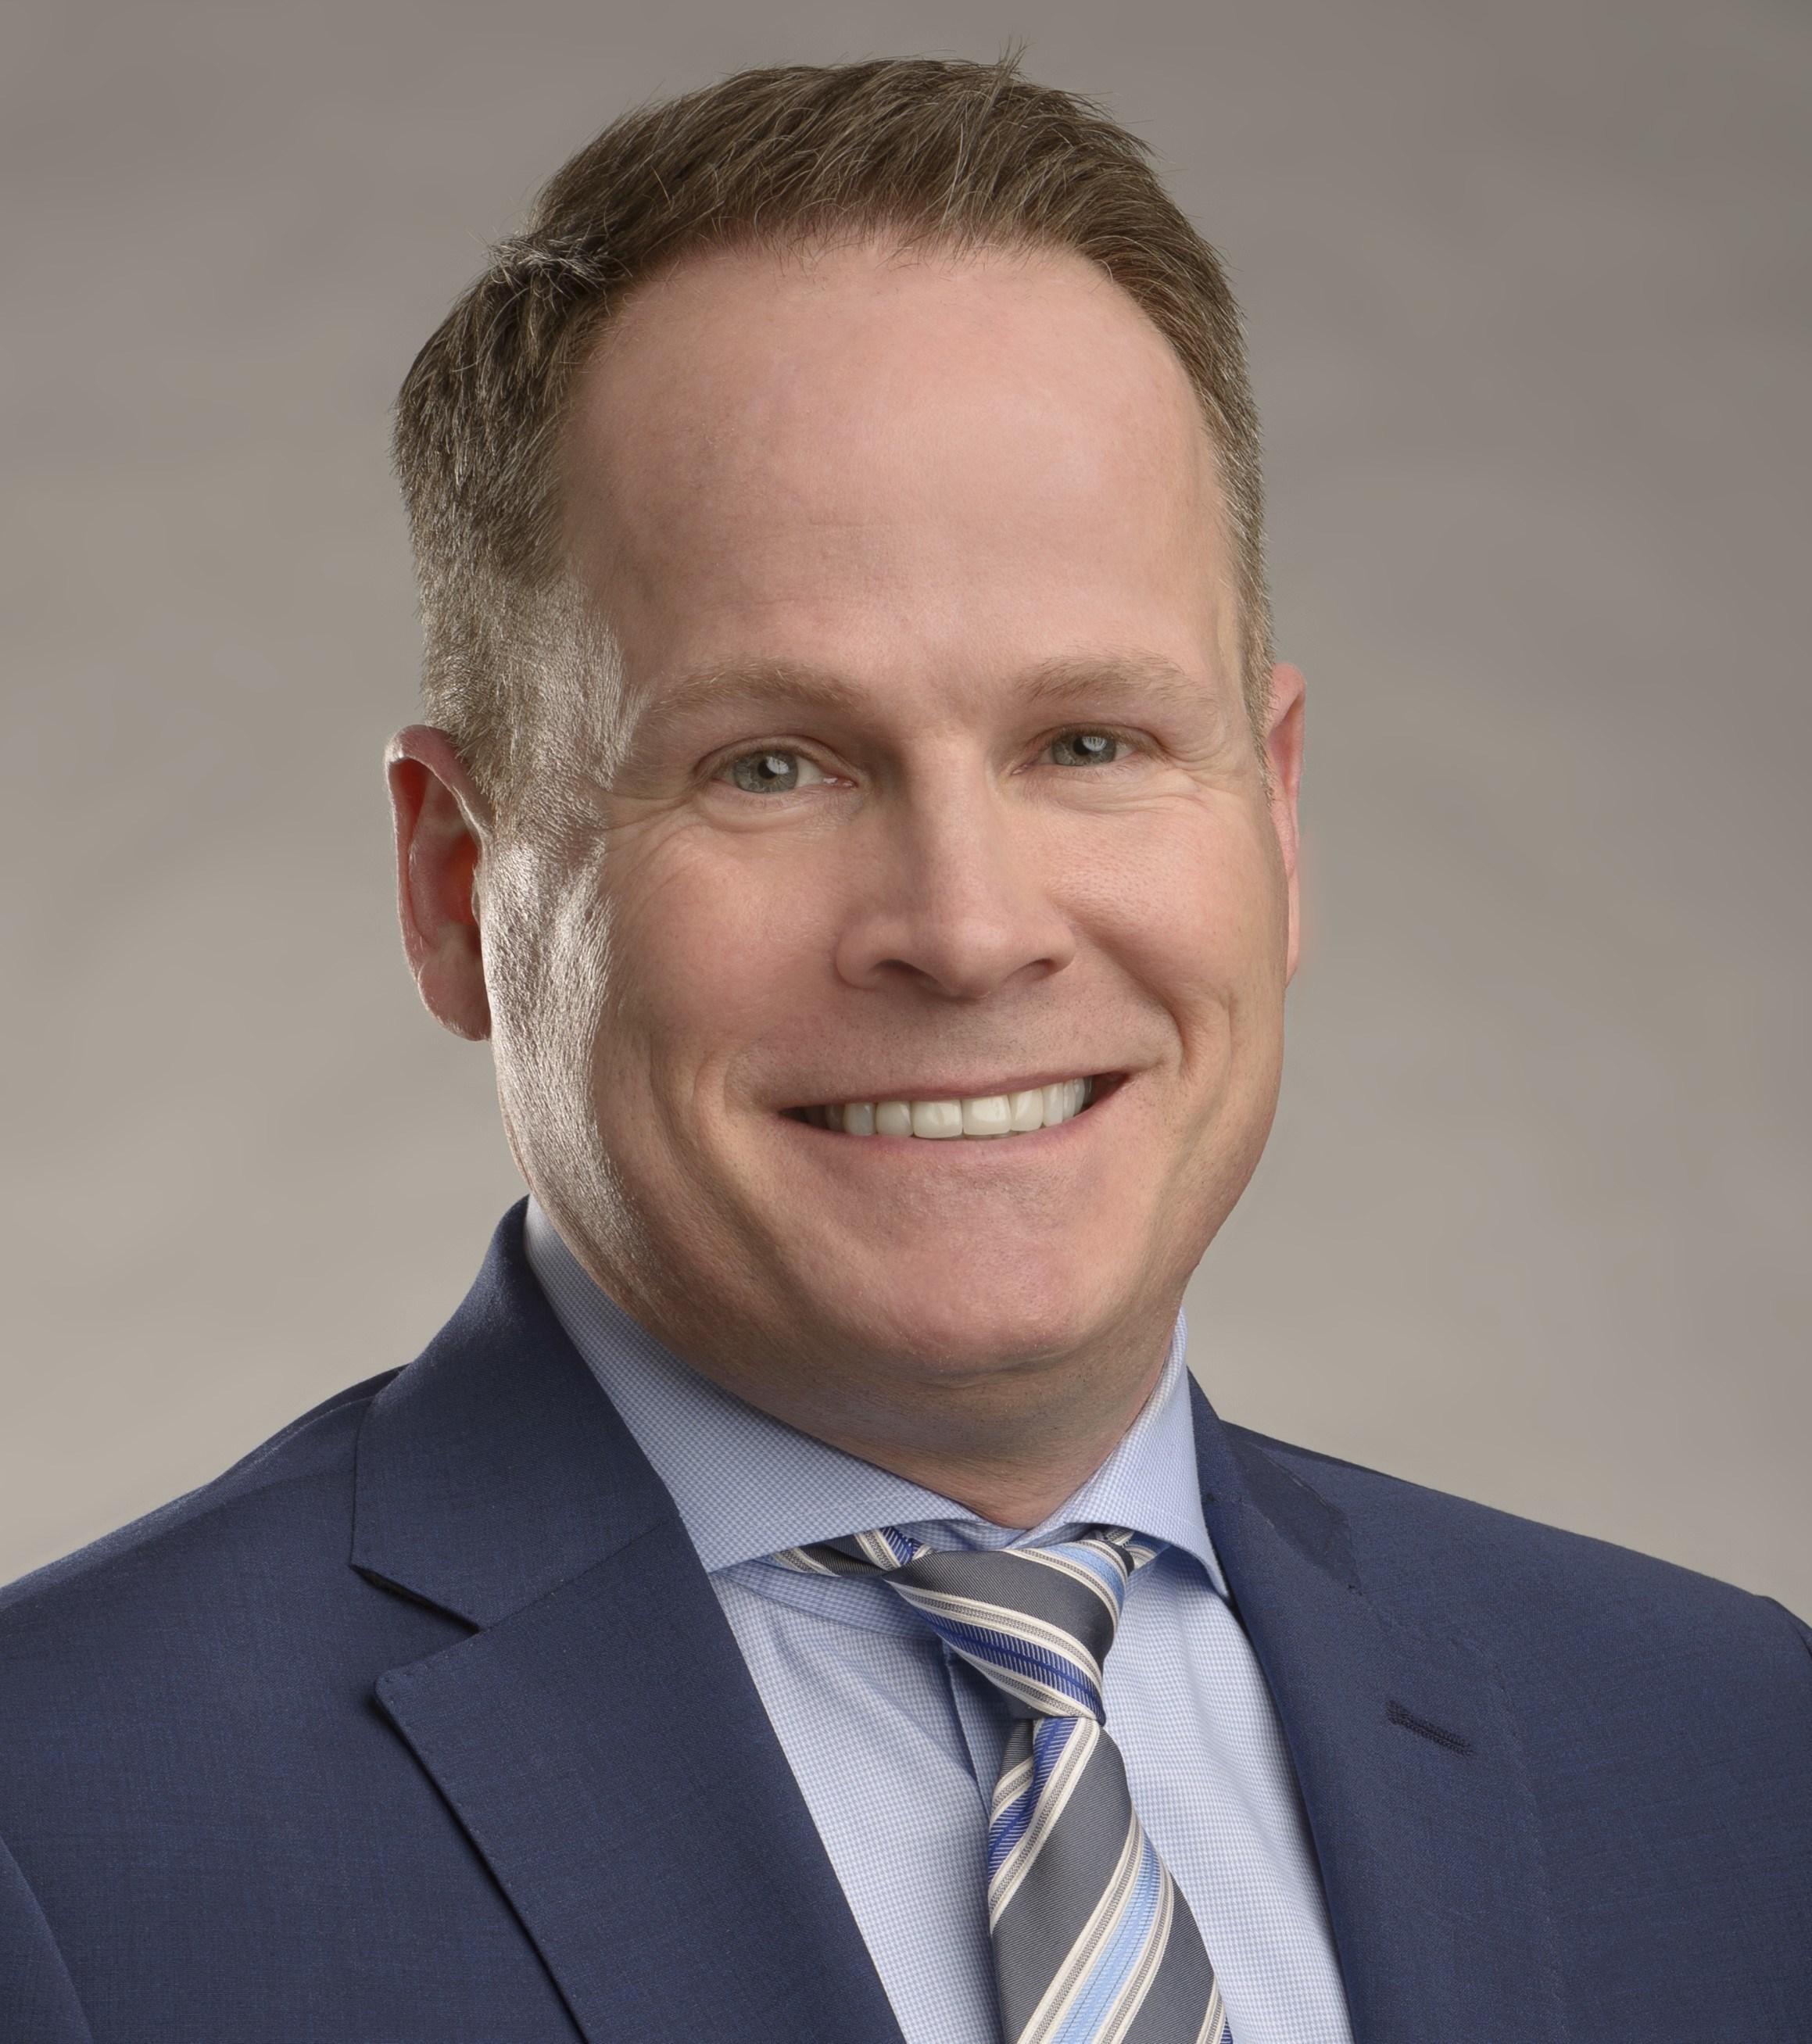 Farmers Insurance Names Chris Flint As President Of Farmers New